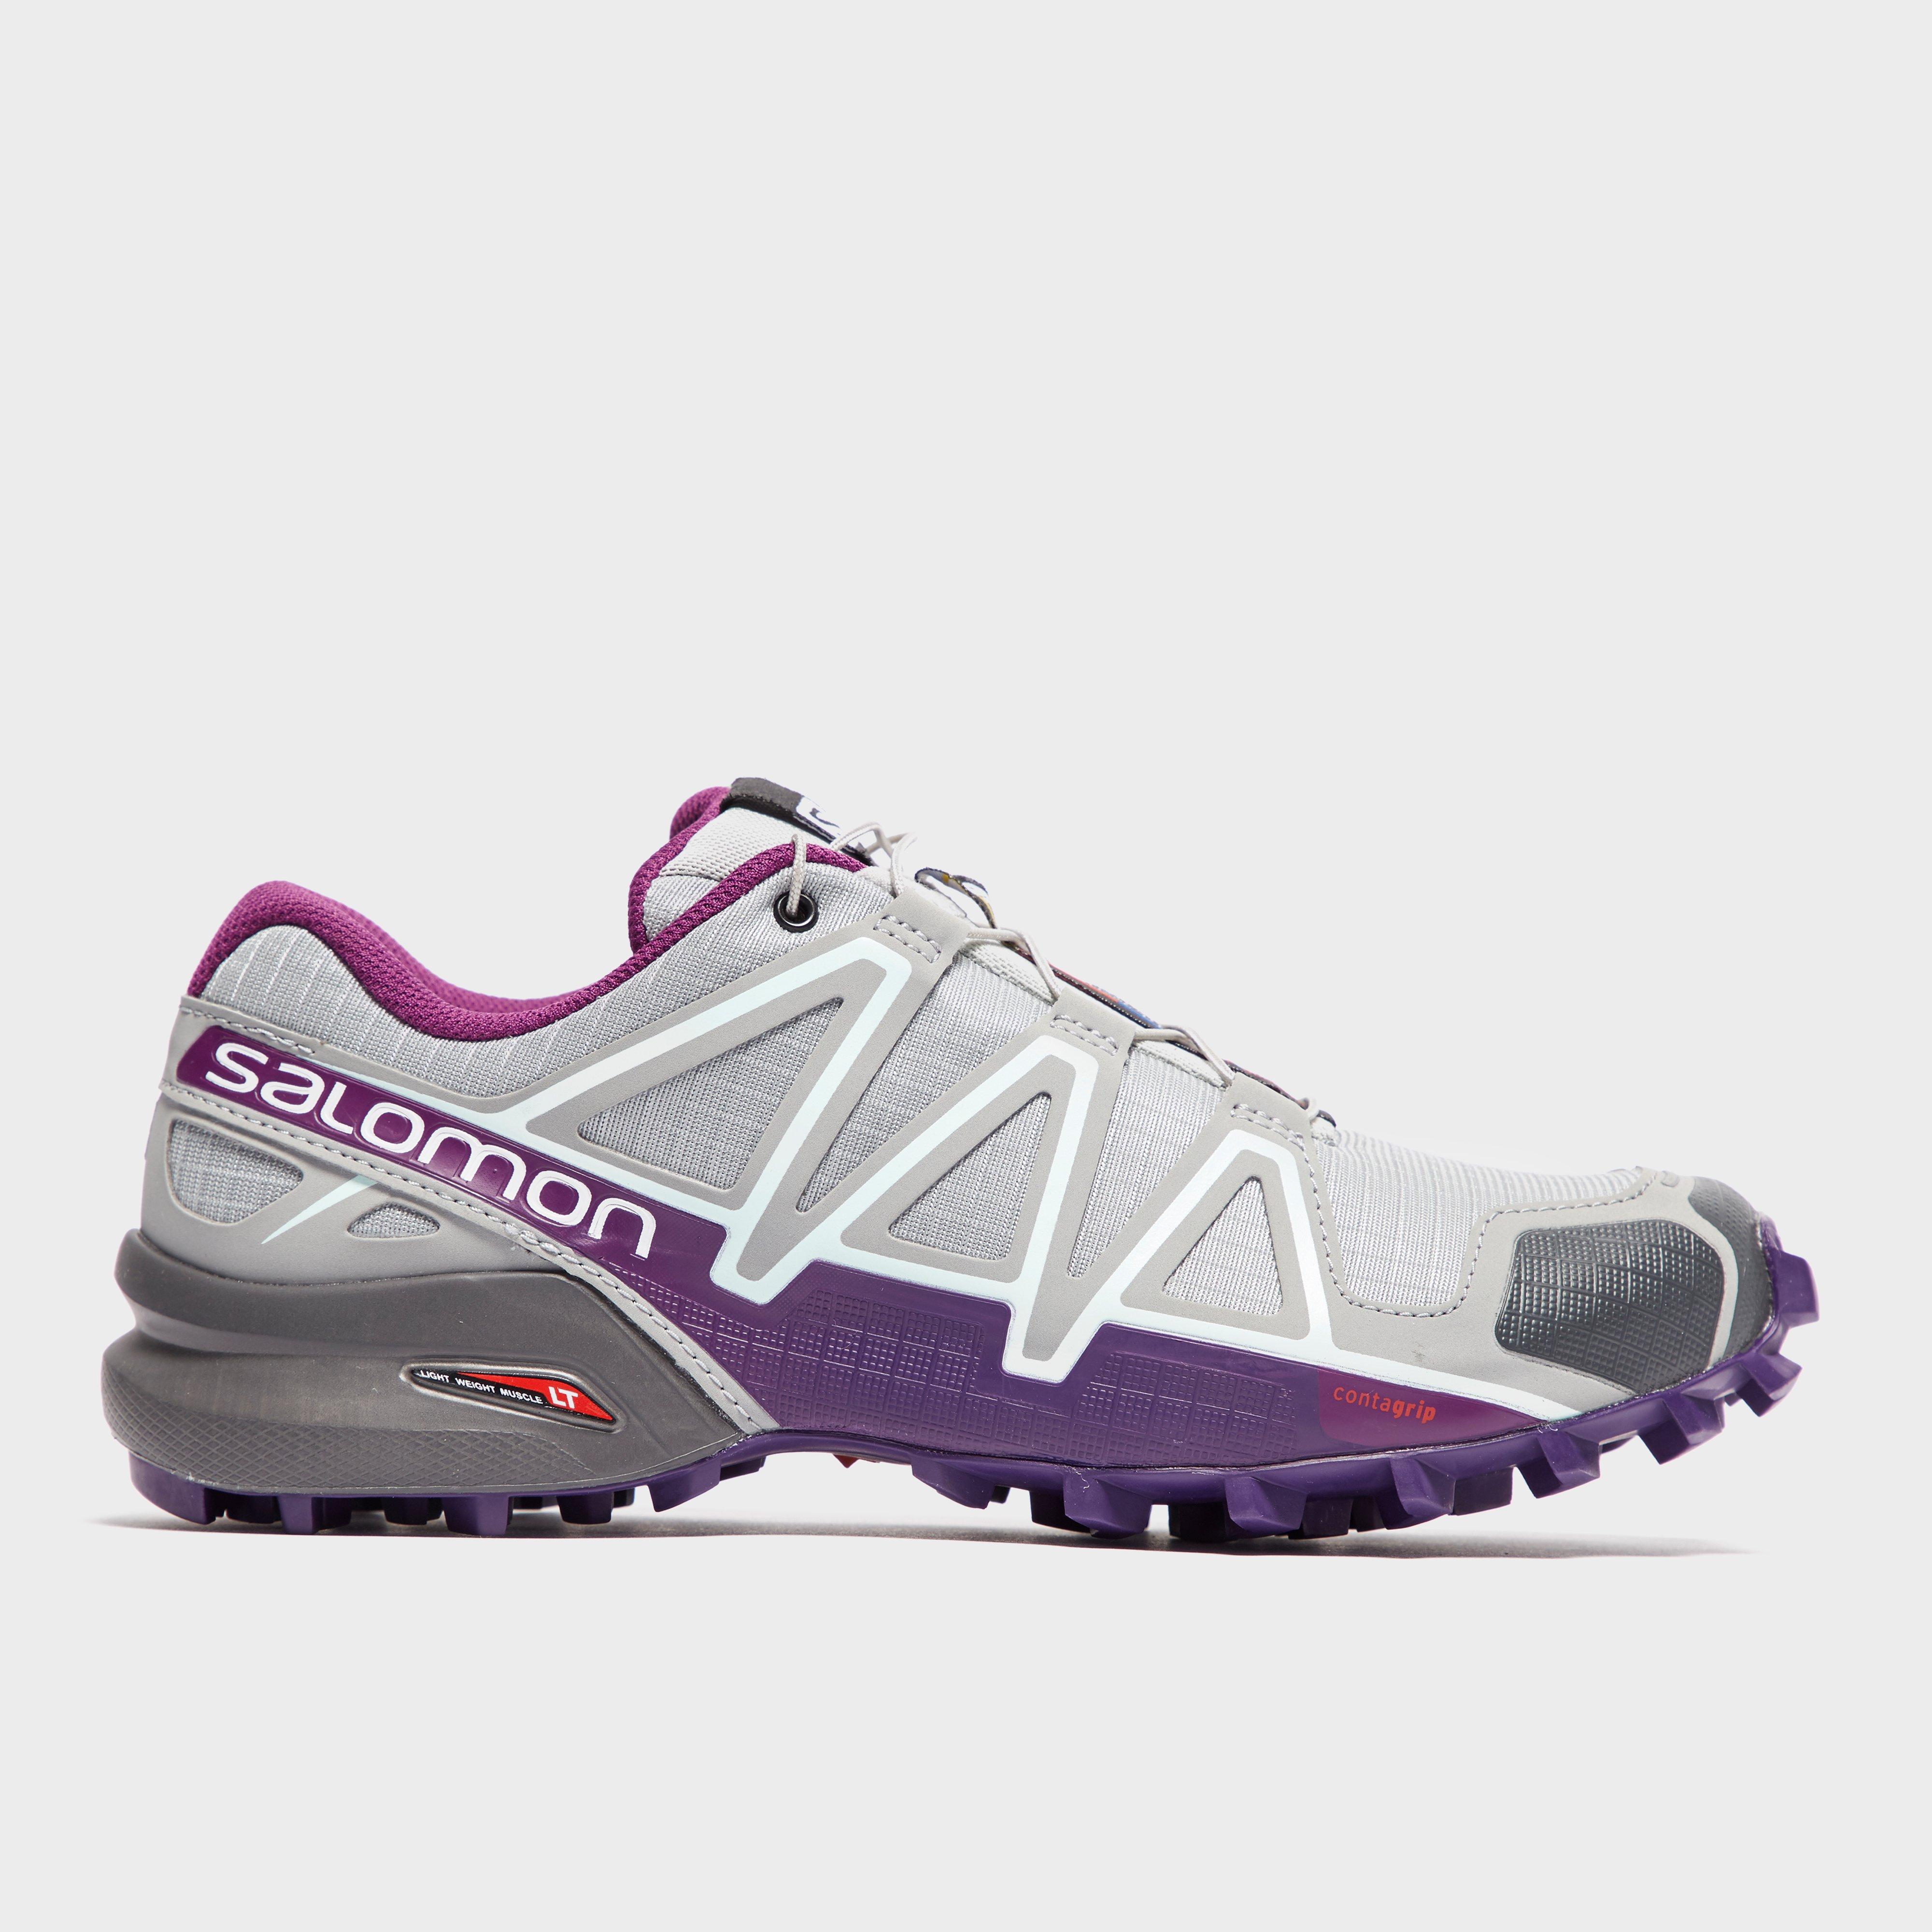 768ae1dbeb87 Light Grey Salomon Women s Speedcross 4 Trail Running Shoes image 1